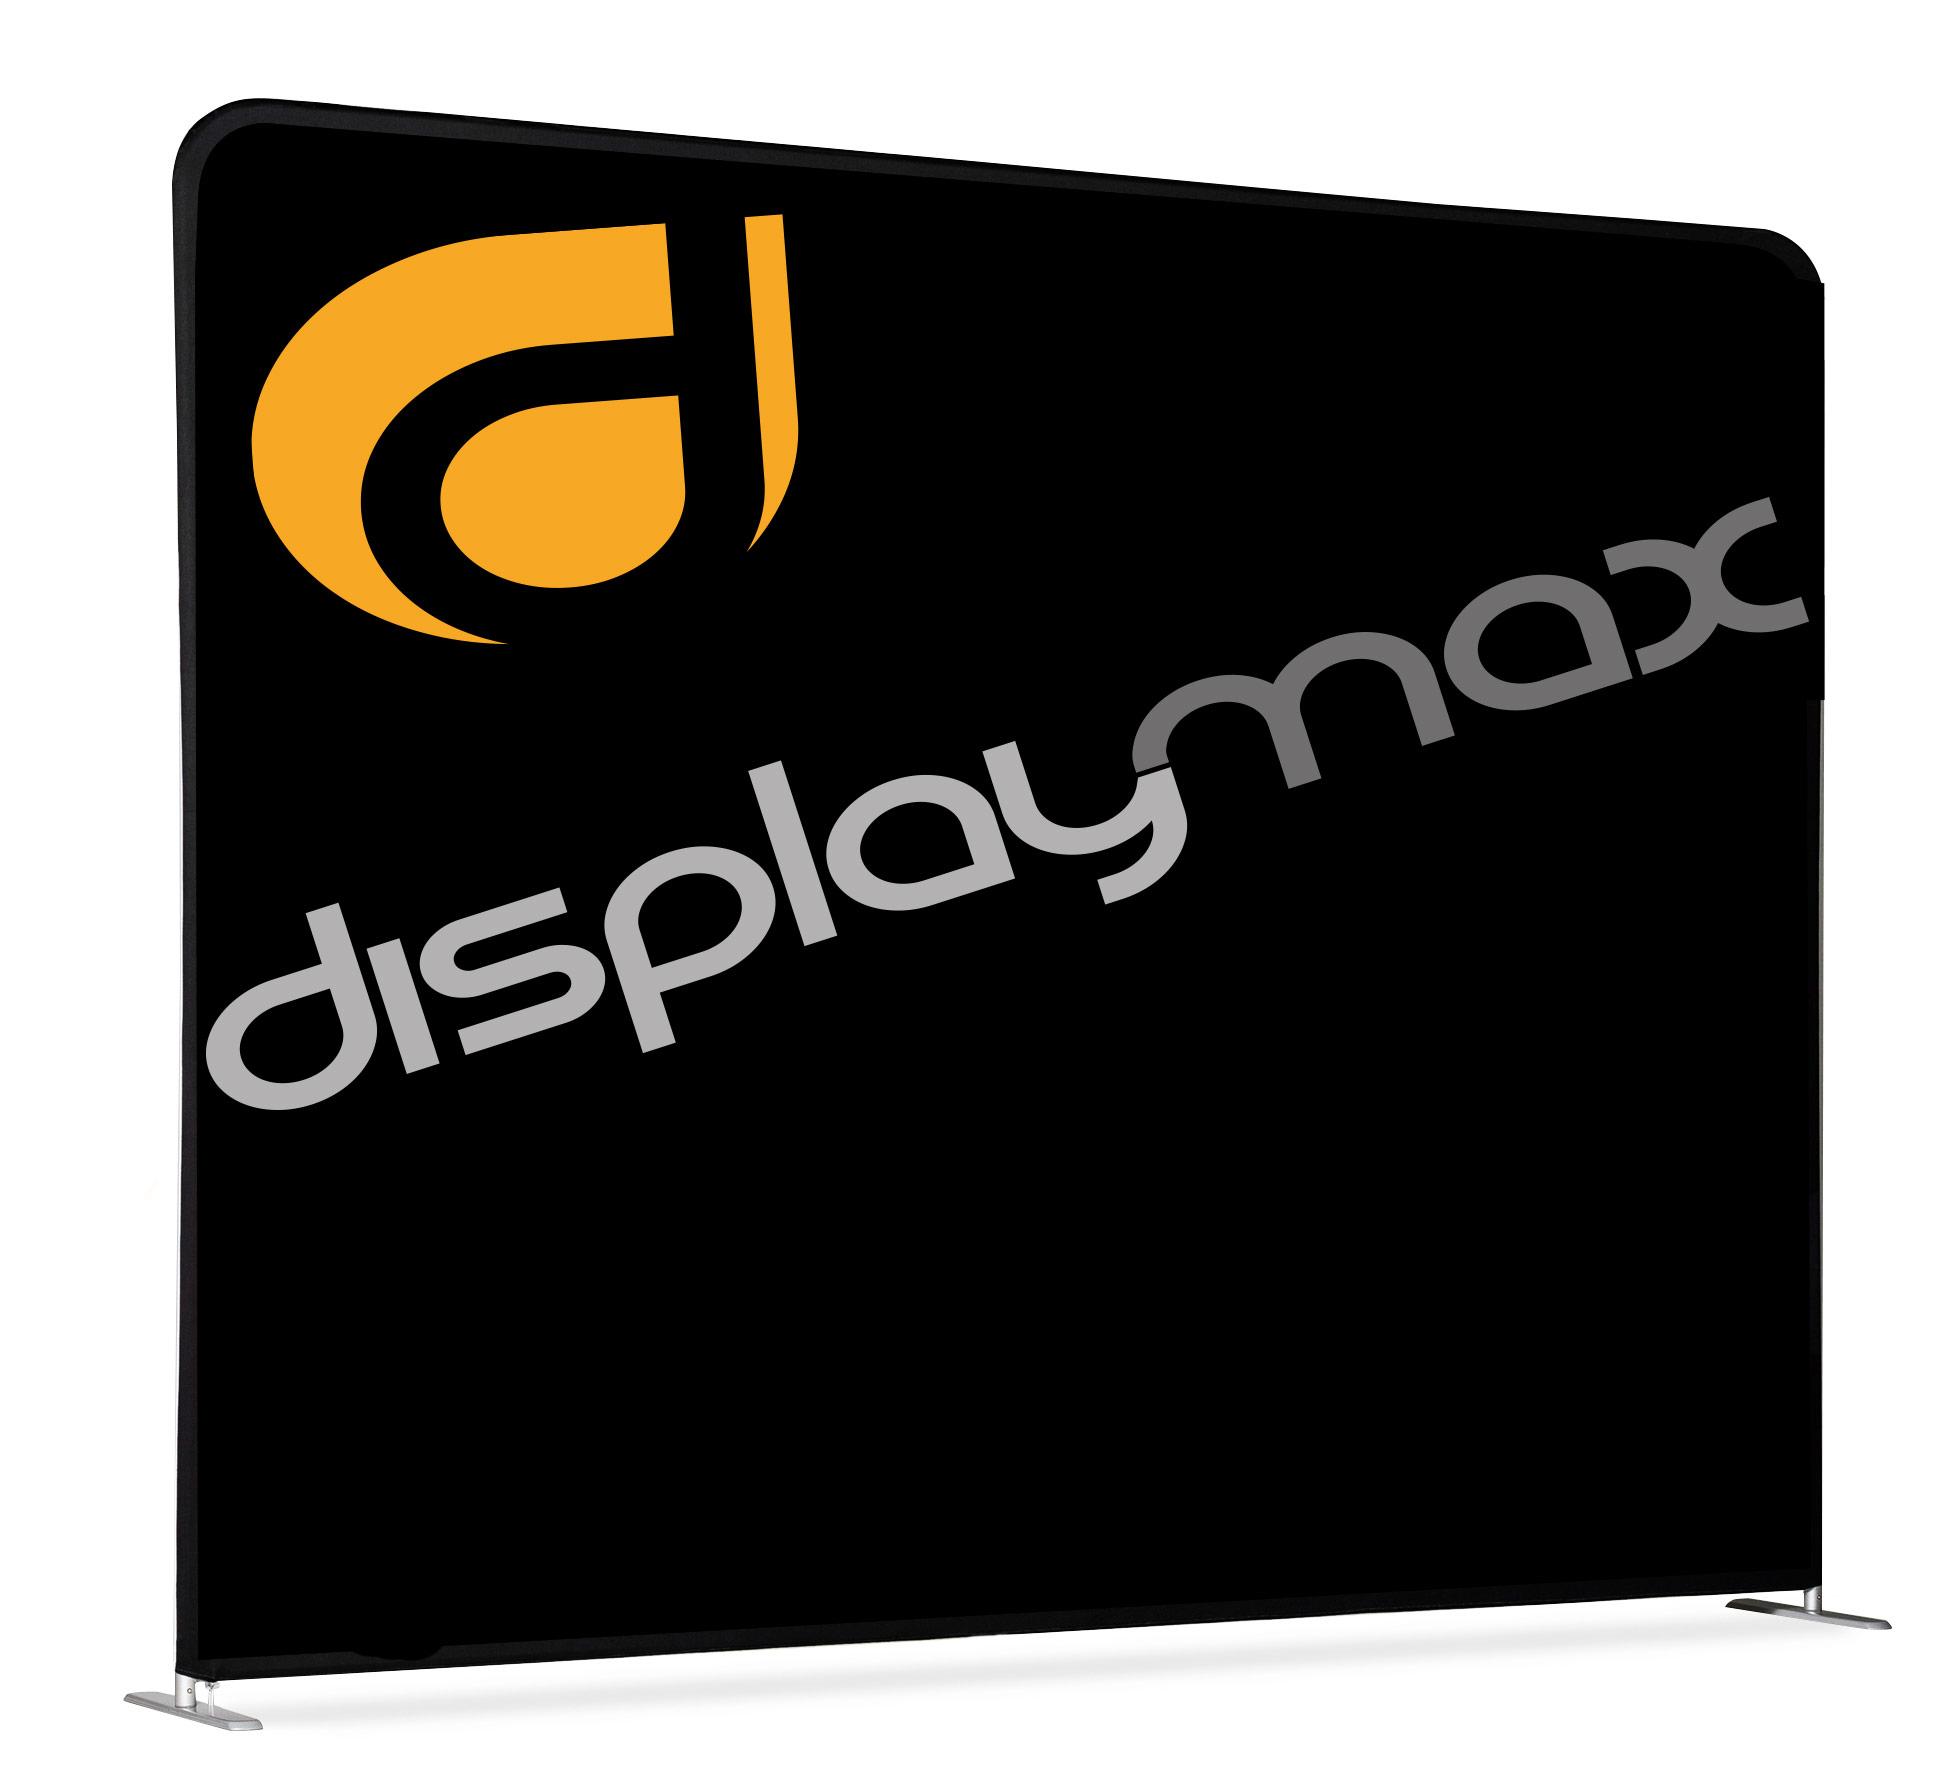 display max zipper wall straight 400x230cm praktische gerade messewand. Black Bedroom Furniture Sets. Home Design Ideas